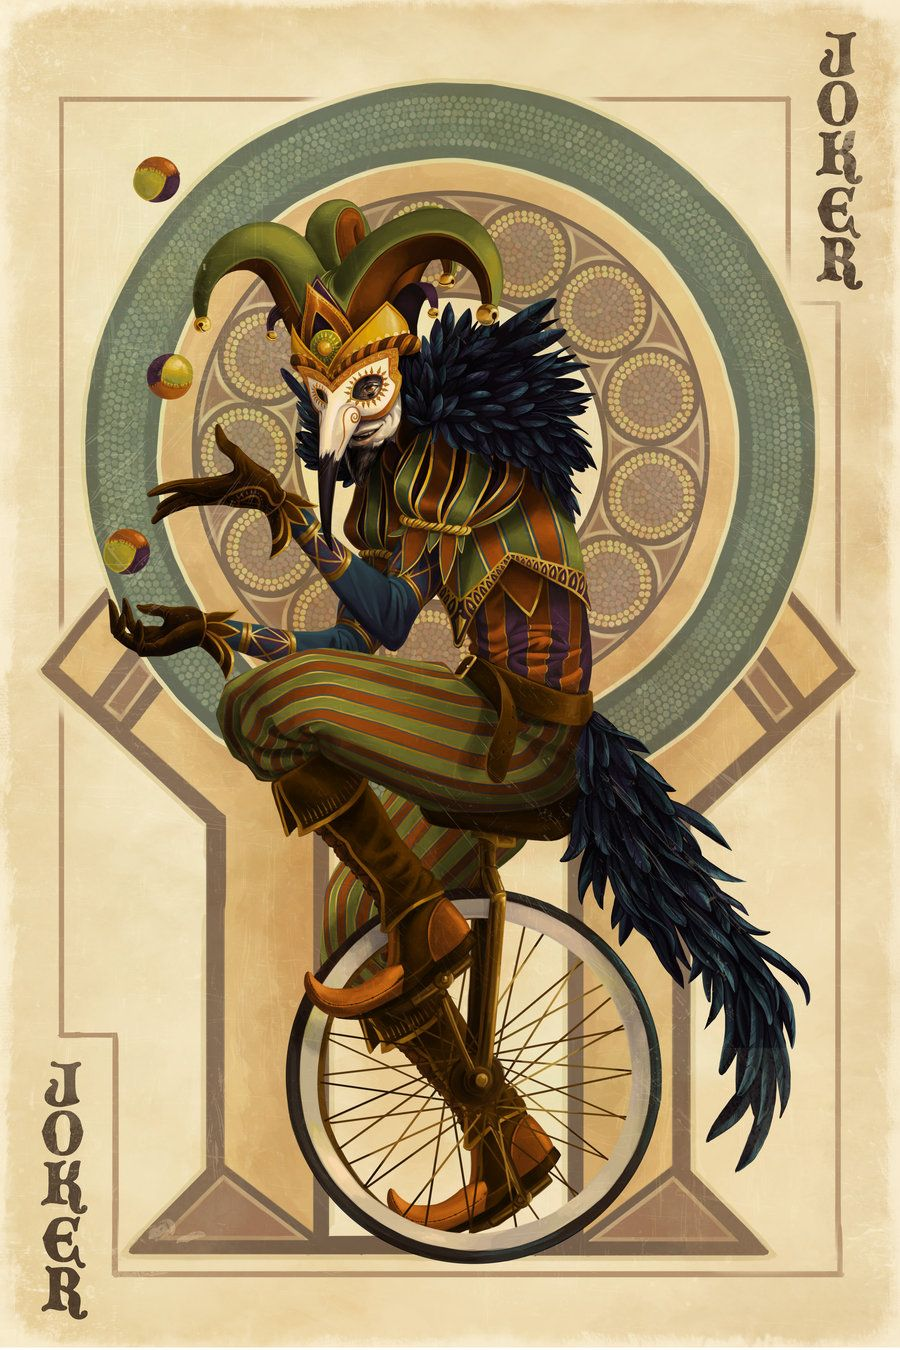 Joker Card By Chronoperates.deviantart.com #piel #shoppiel